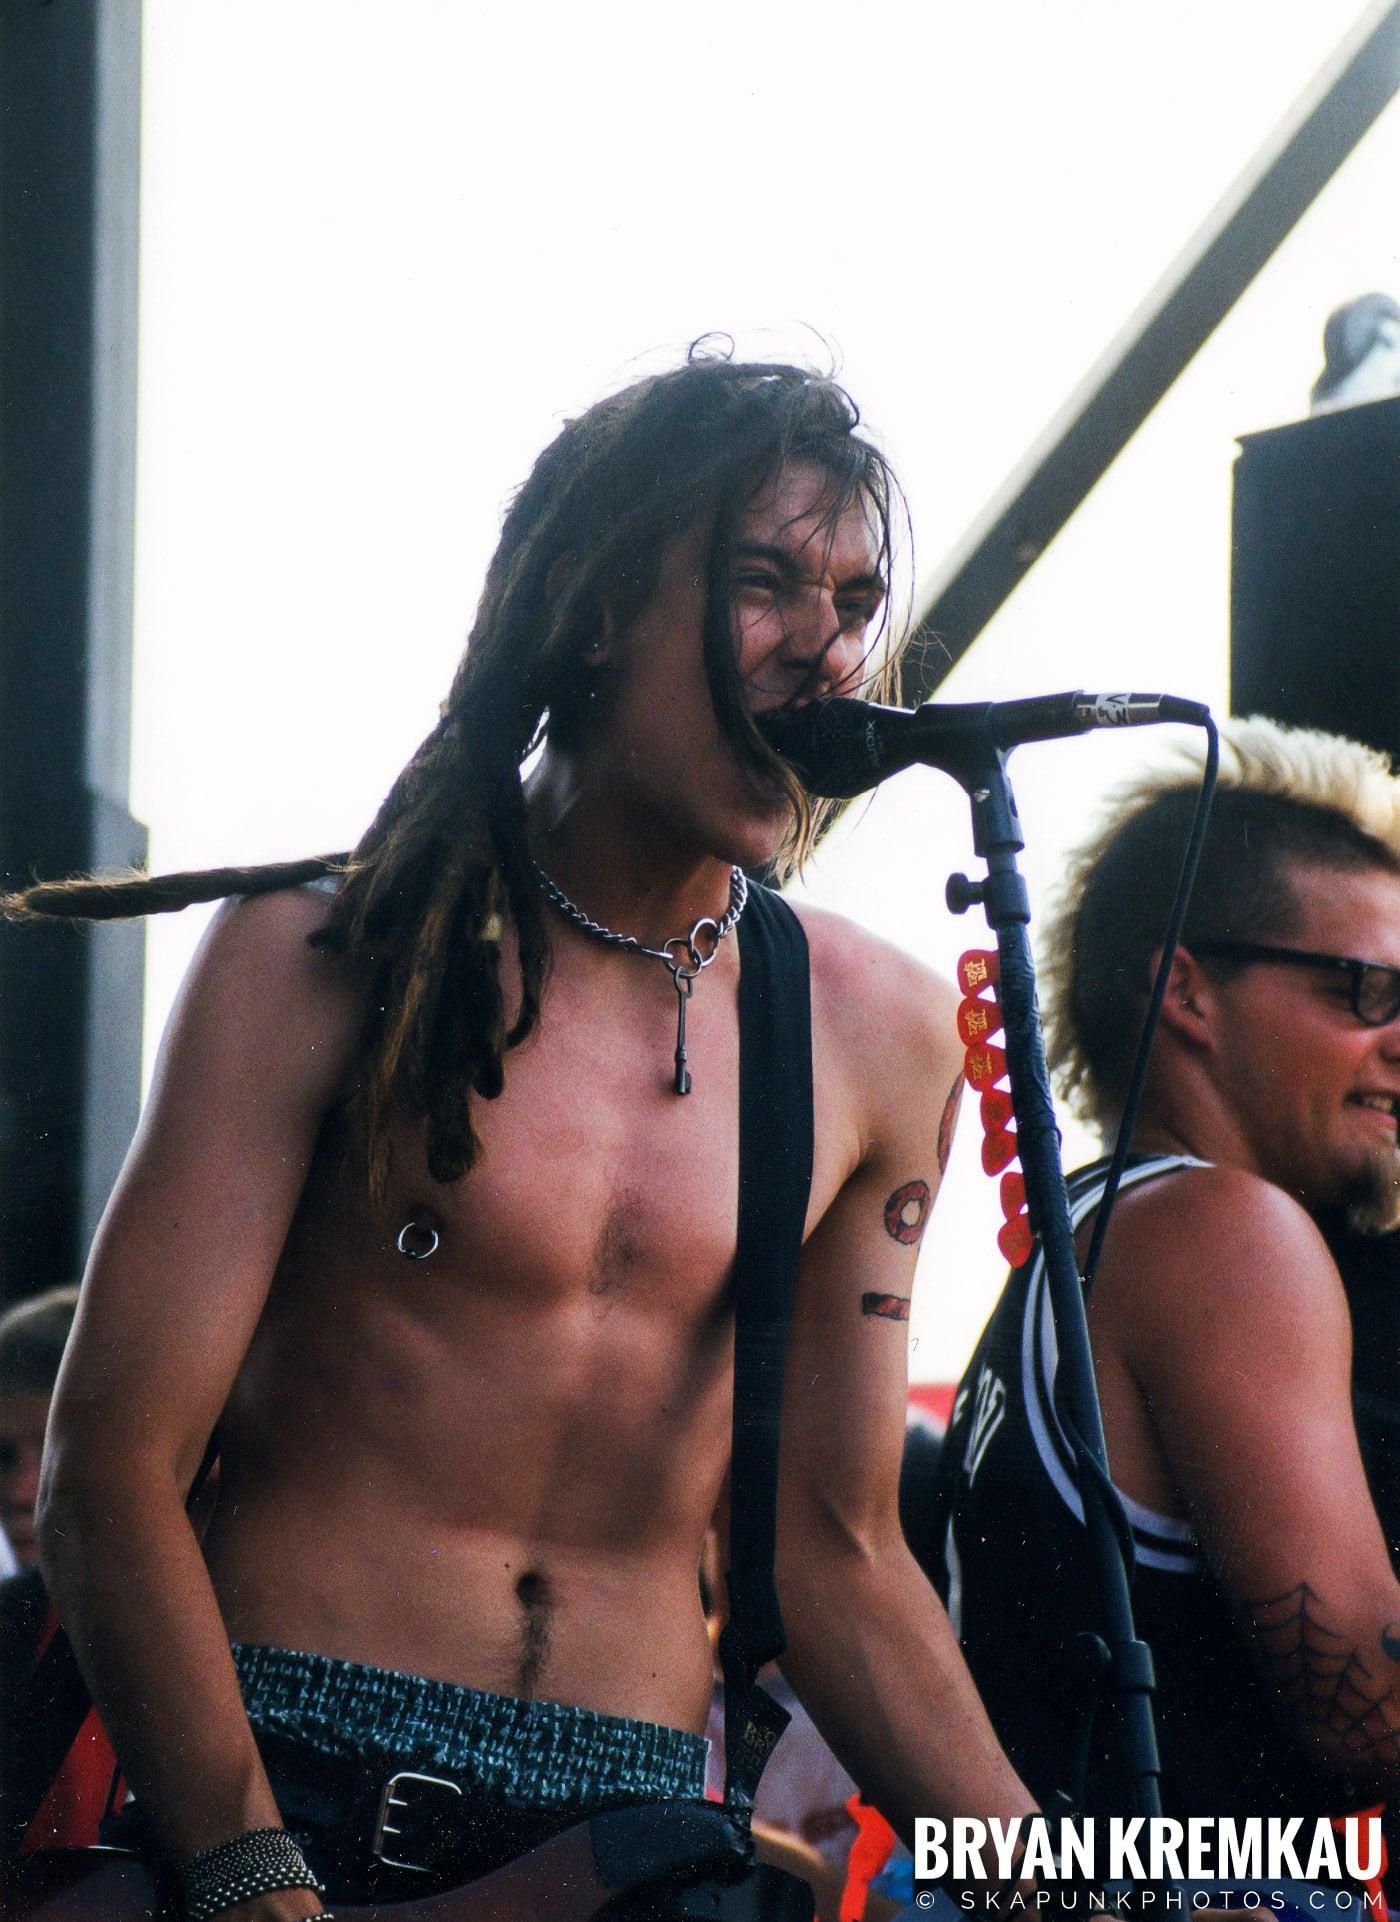 Less Than Jake @ Vans Warped Tour, Randall's Island, NYC - 7.16.99 (6)